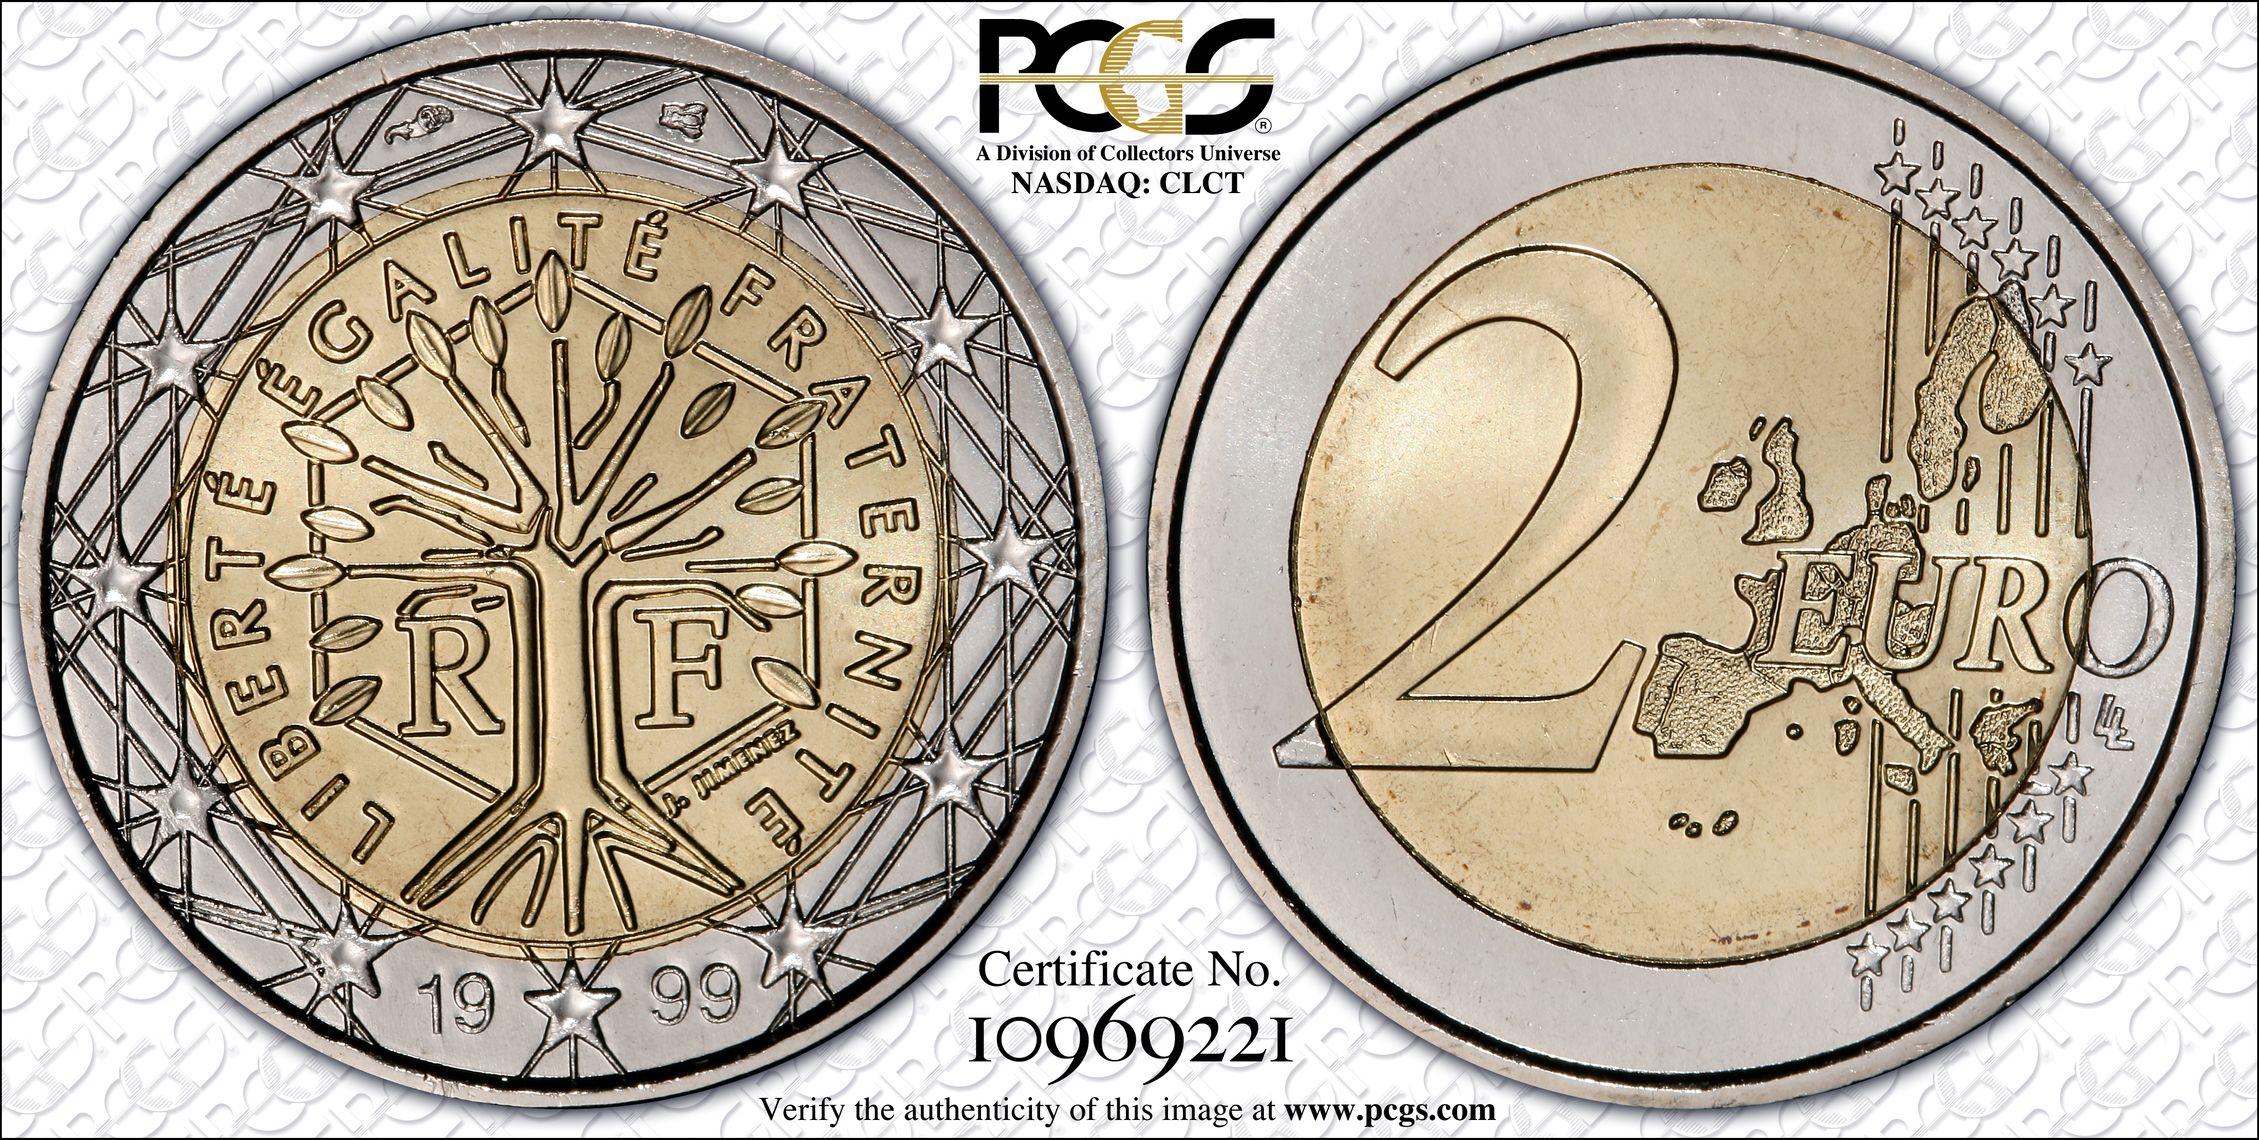 PCGS Set Registry: 1999 € 2 #10969221